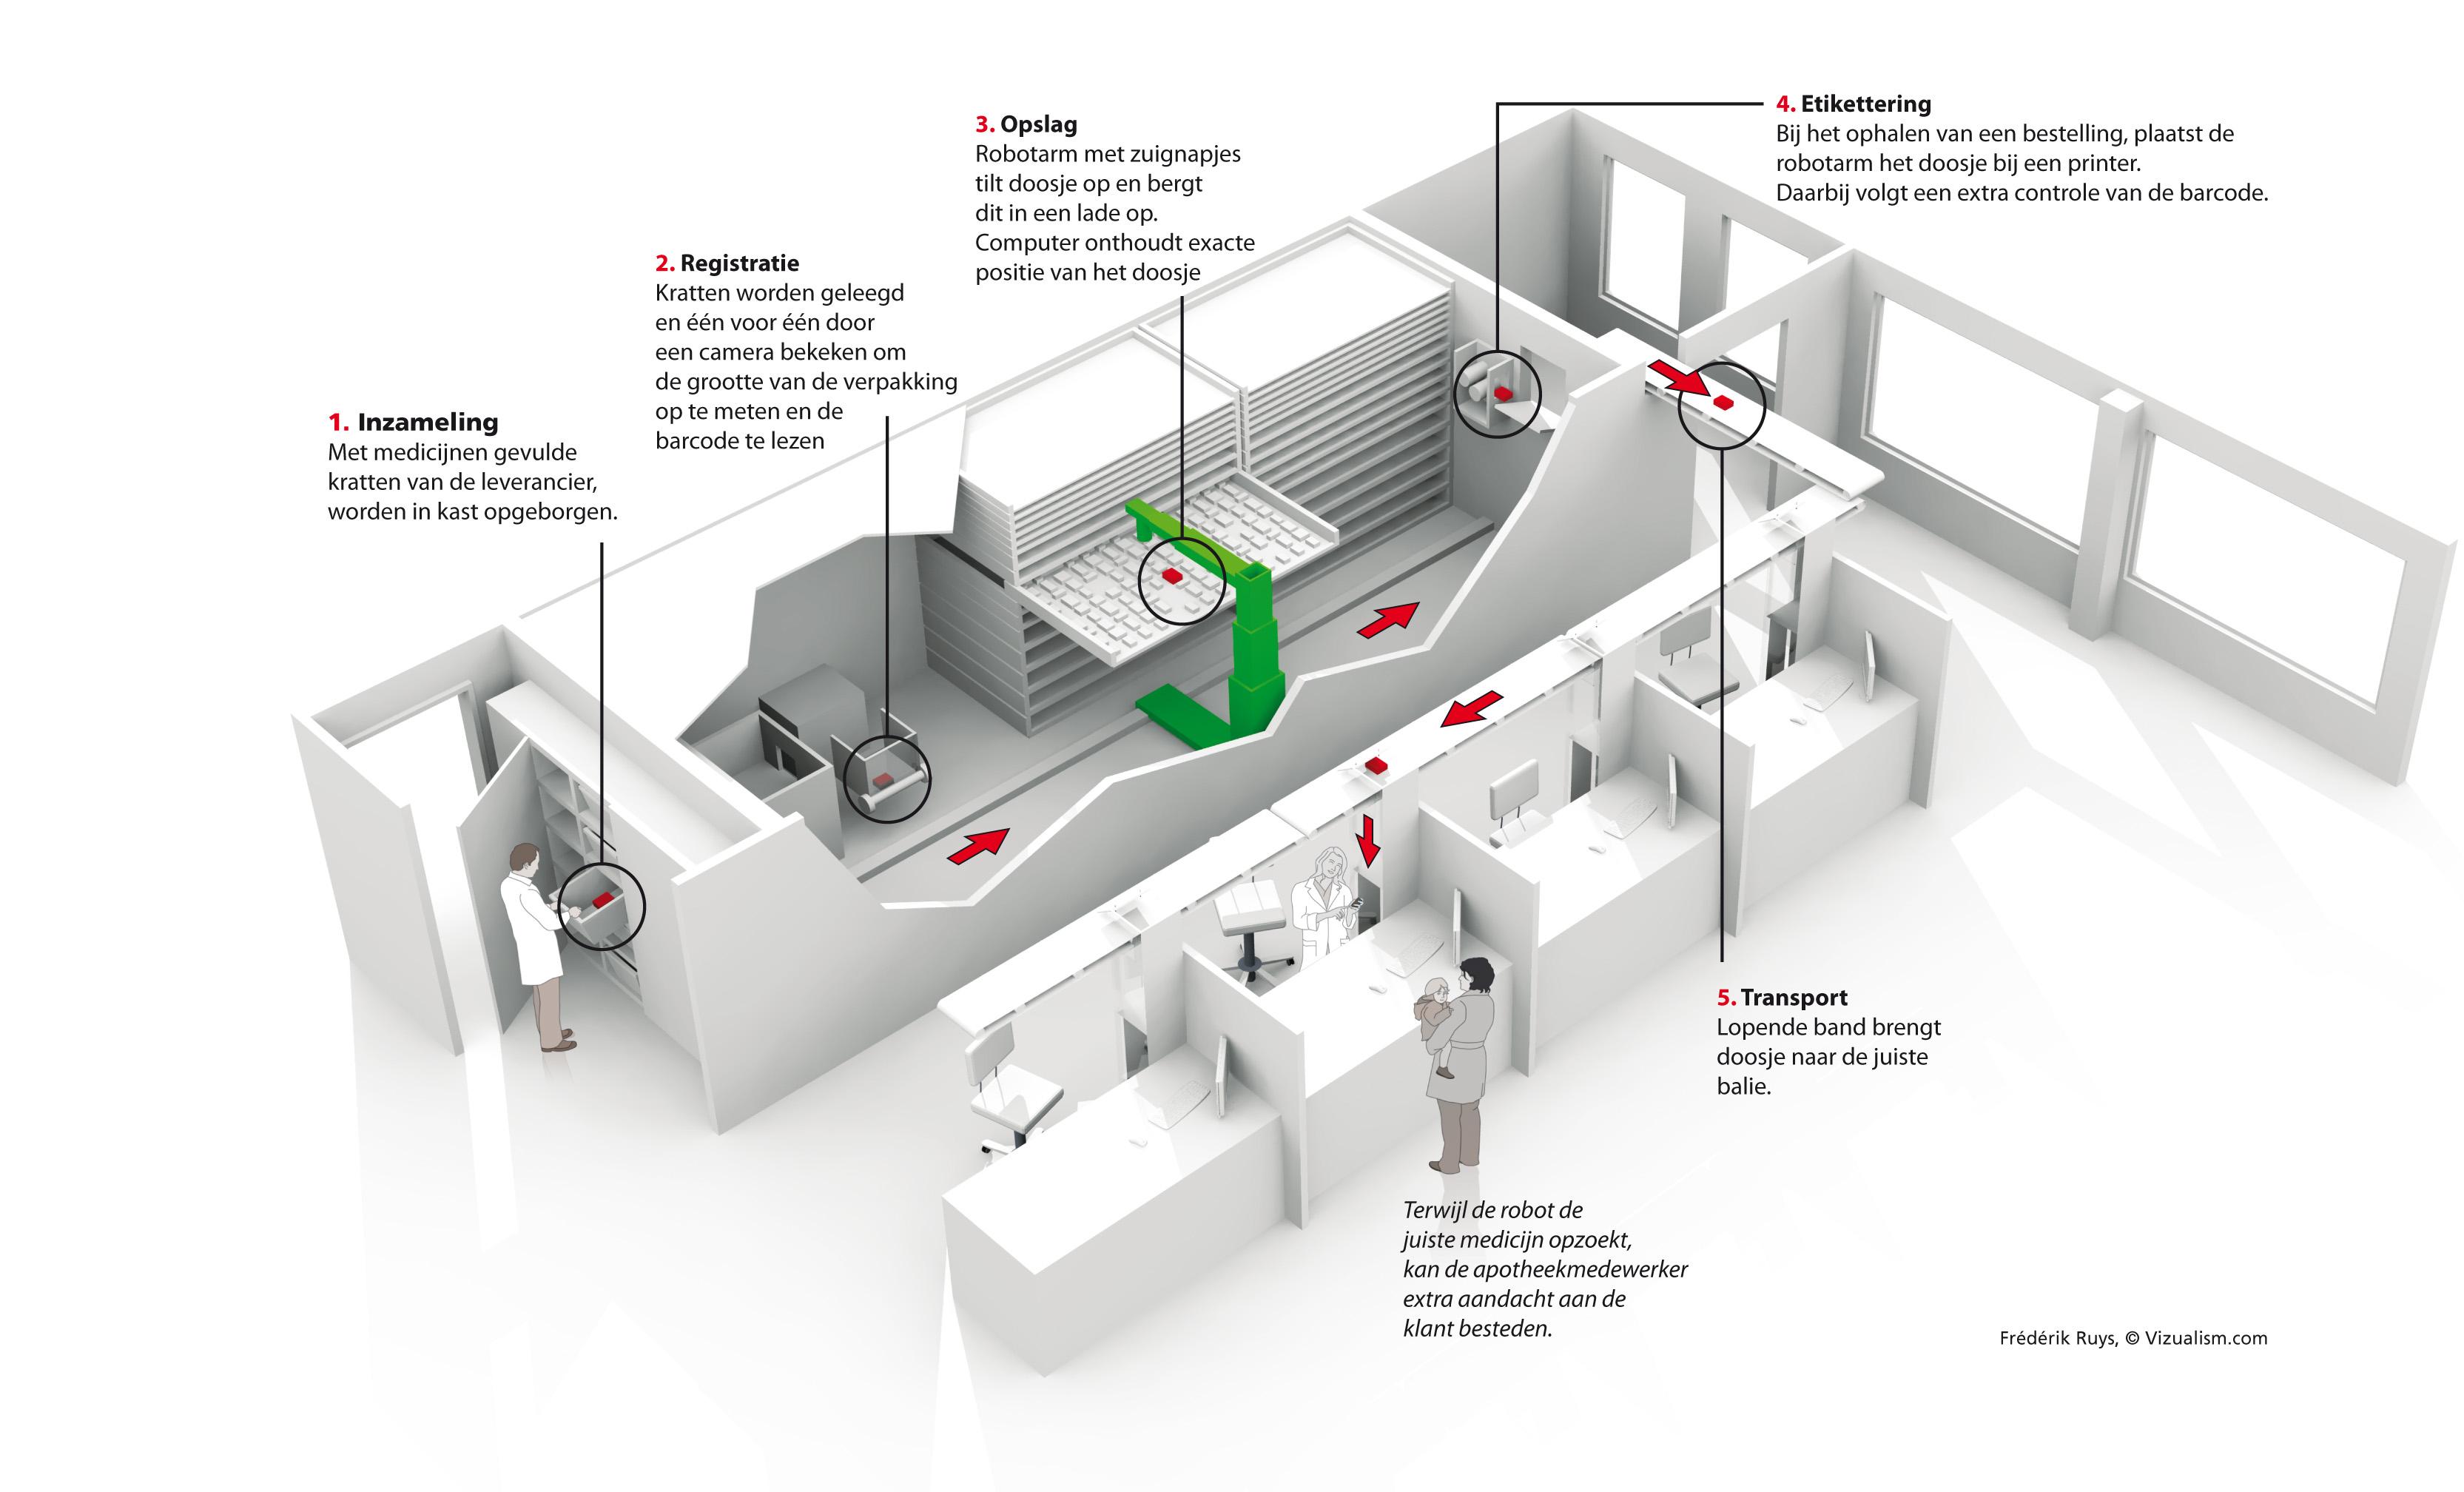 The hospital pharmacy robot - Vizualism